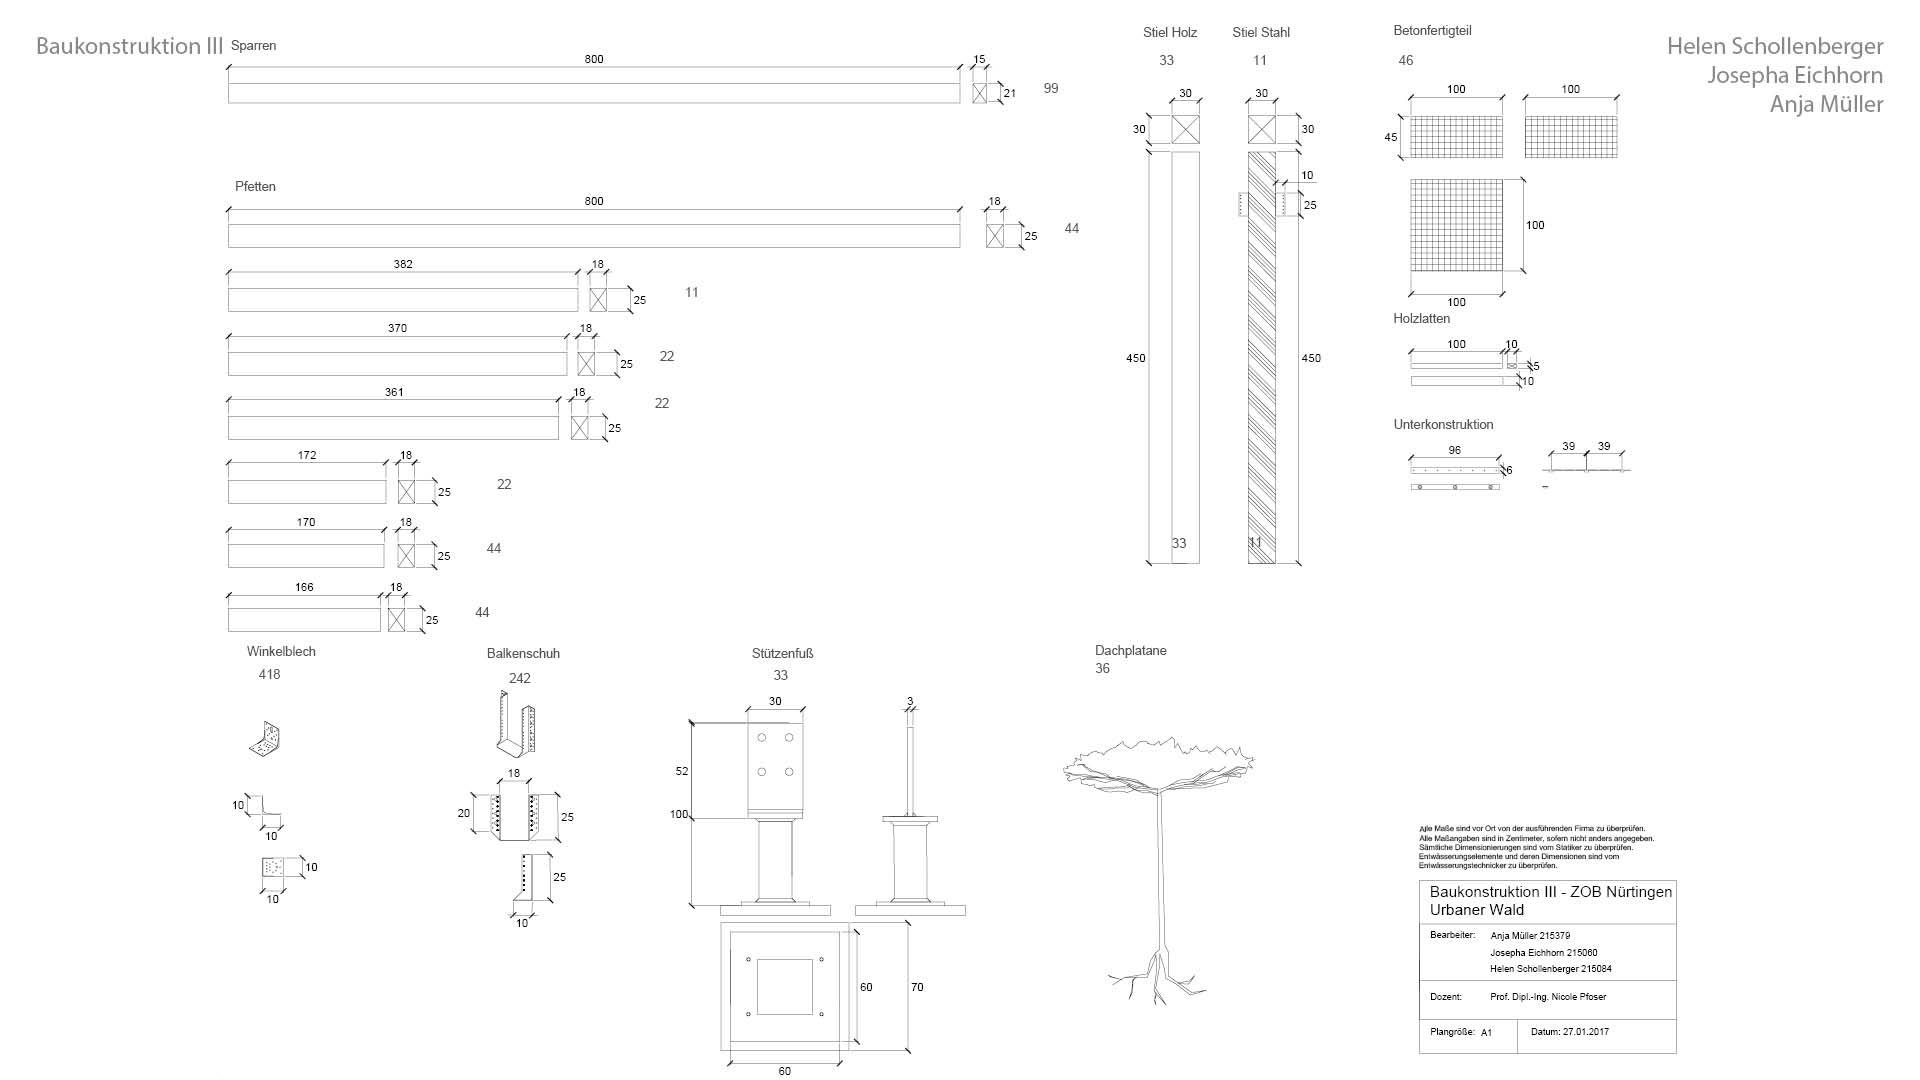 09 16 3 Baukonstruktion 3